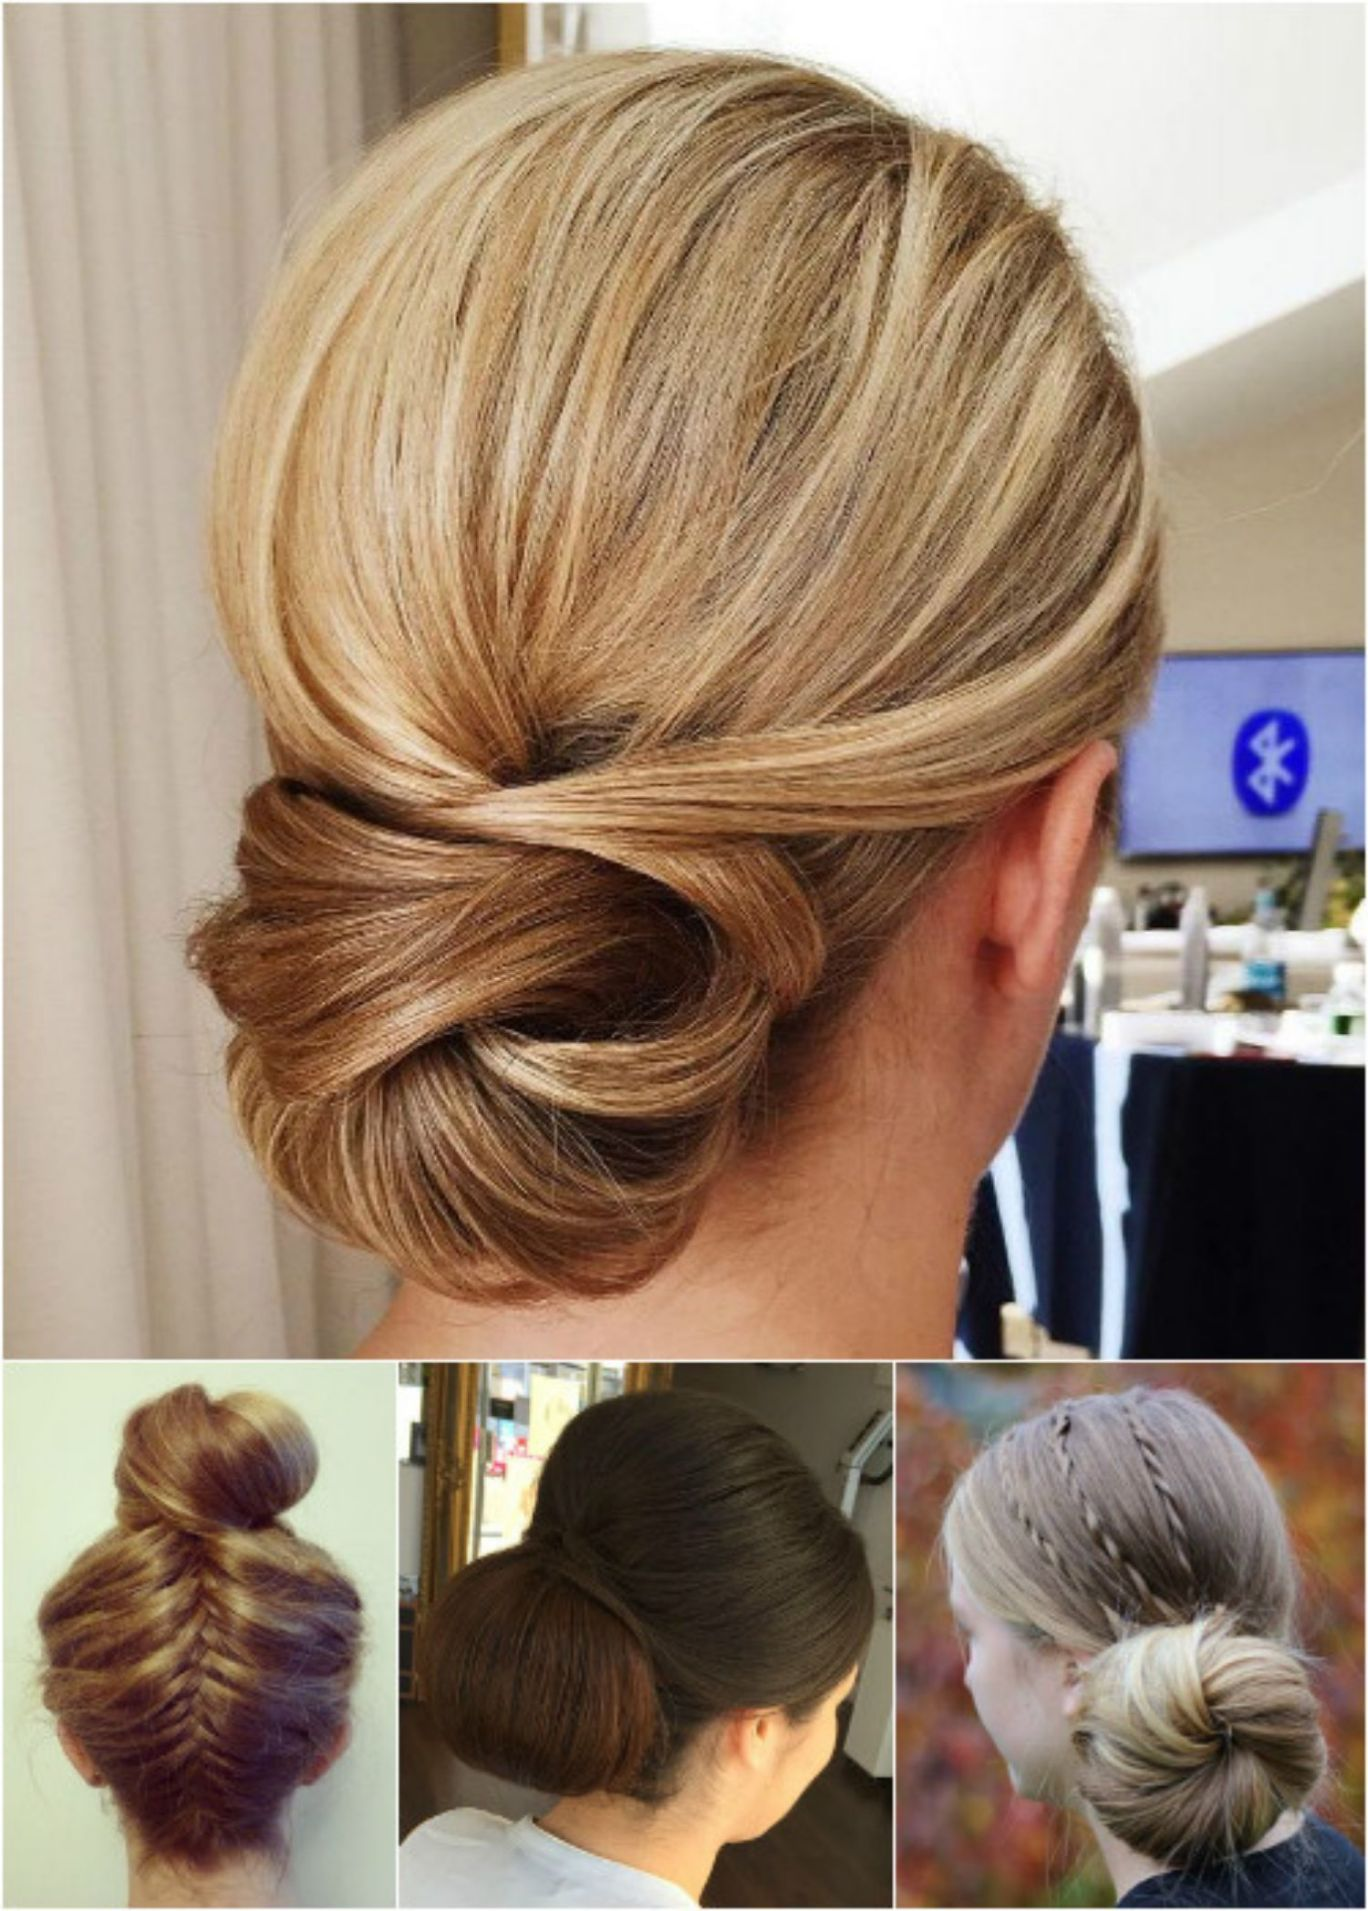 60 Trendiest Updos for Medium Length Hair | Updos for medium length hair, Medium hair styles ...